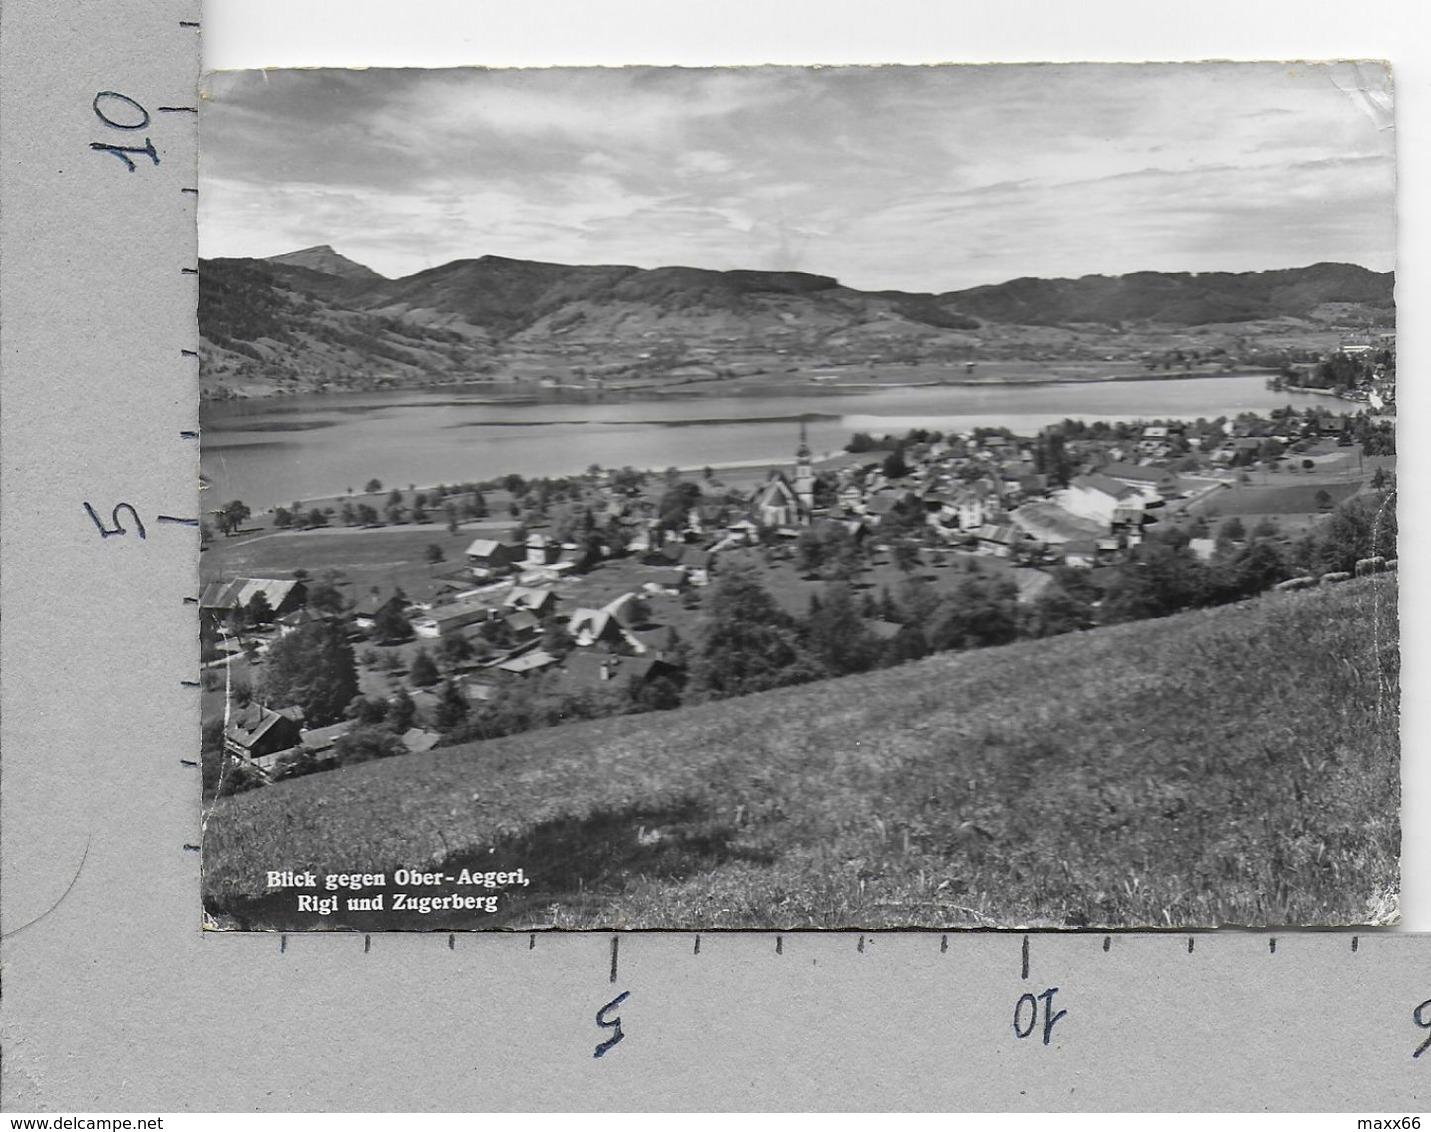 CARTOLINA VG SVIZZERA - Blick Gegen Ober Aegeri Rigi Und Zugerberg - Institut Lichtenberg 10 X 15 - ANN. 1958 - ZG Zoug